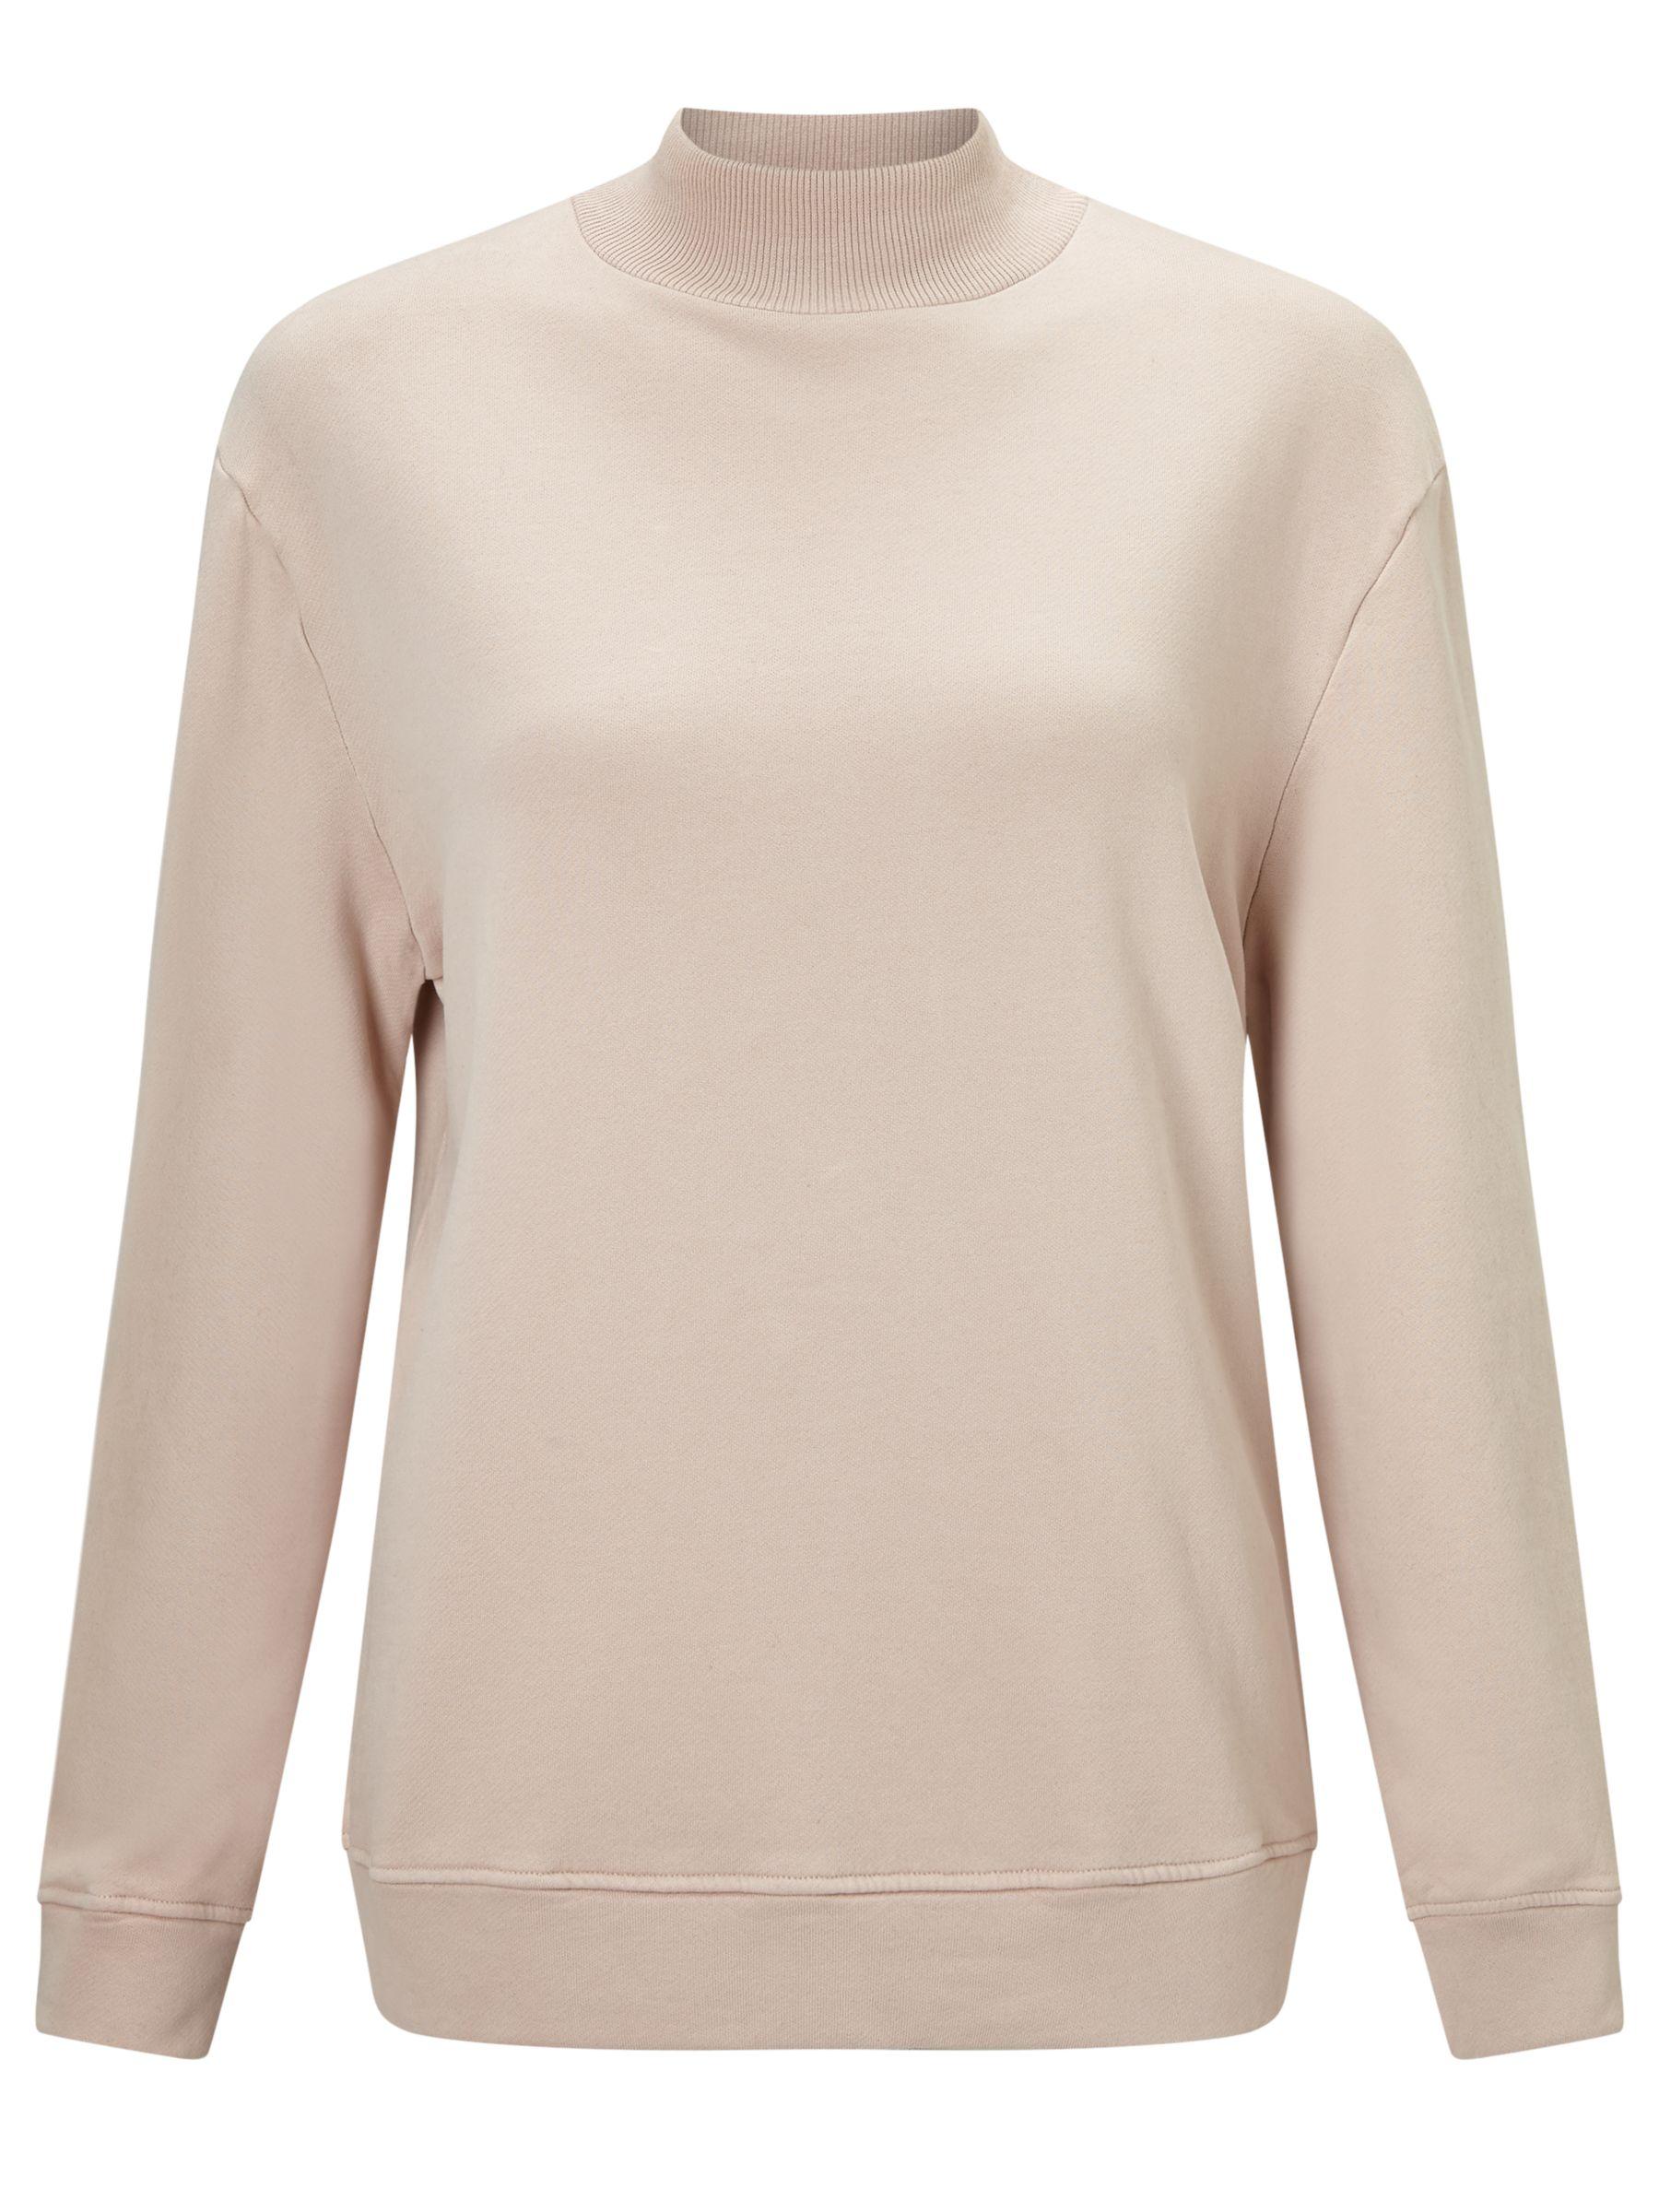 Varley Varley Rochester Sweatshirt, Blush Pink